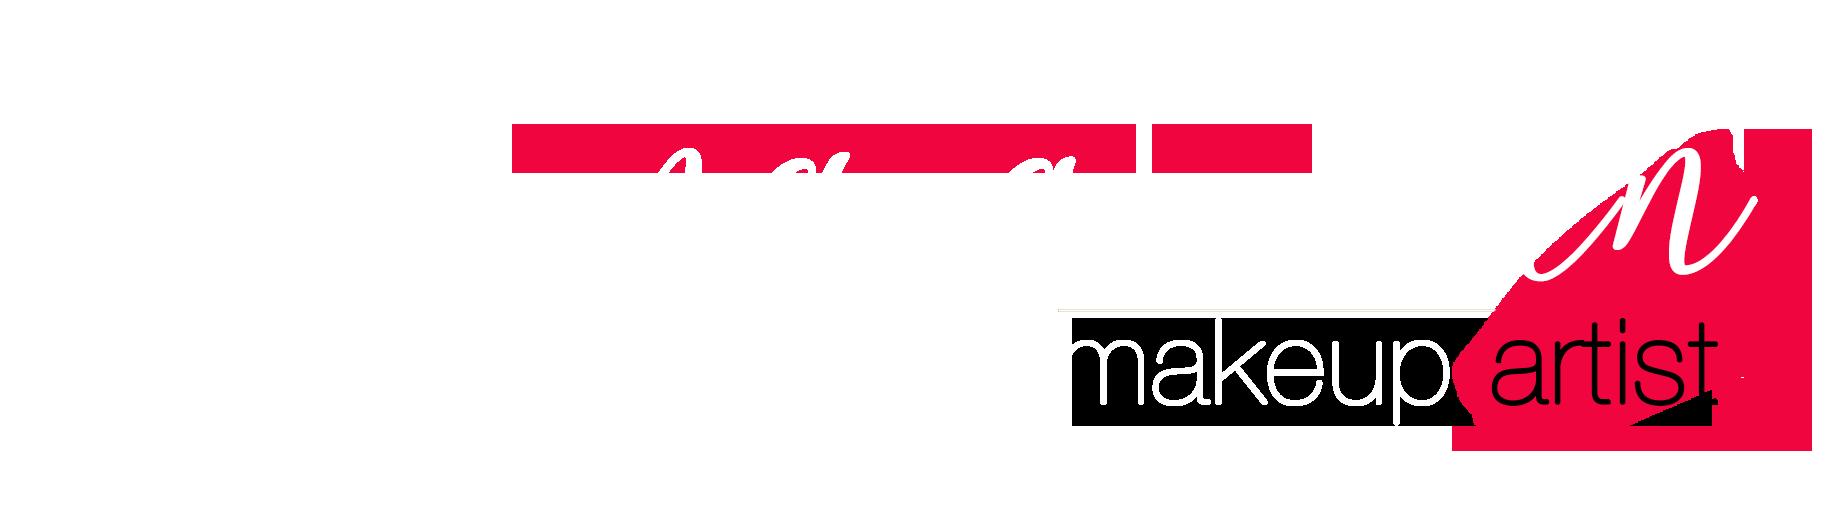 Marina Grikun - Makeup artist